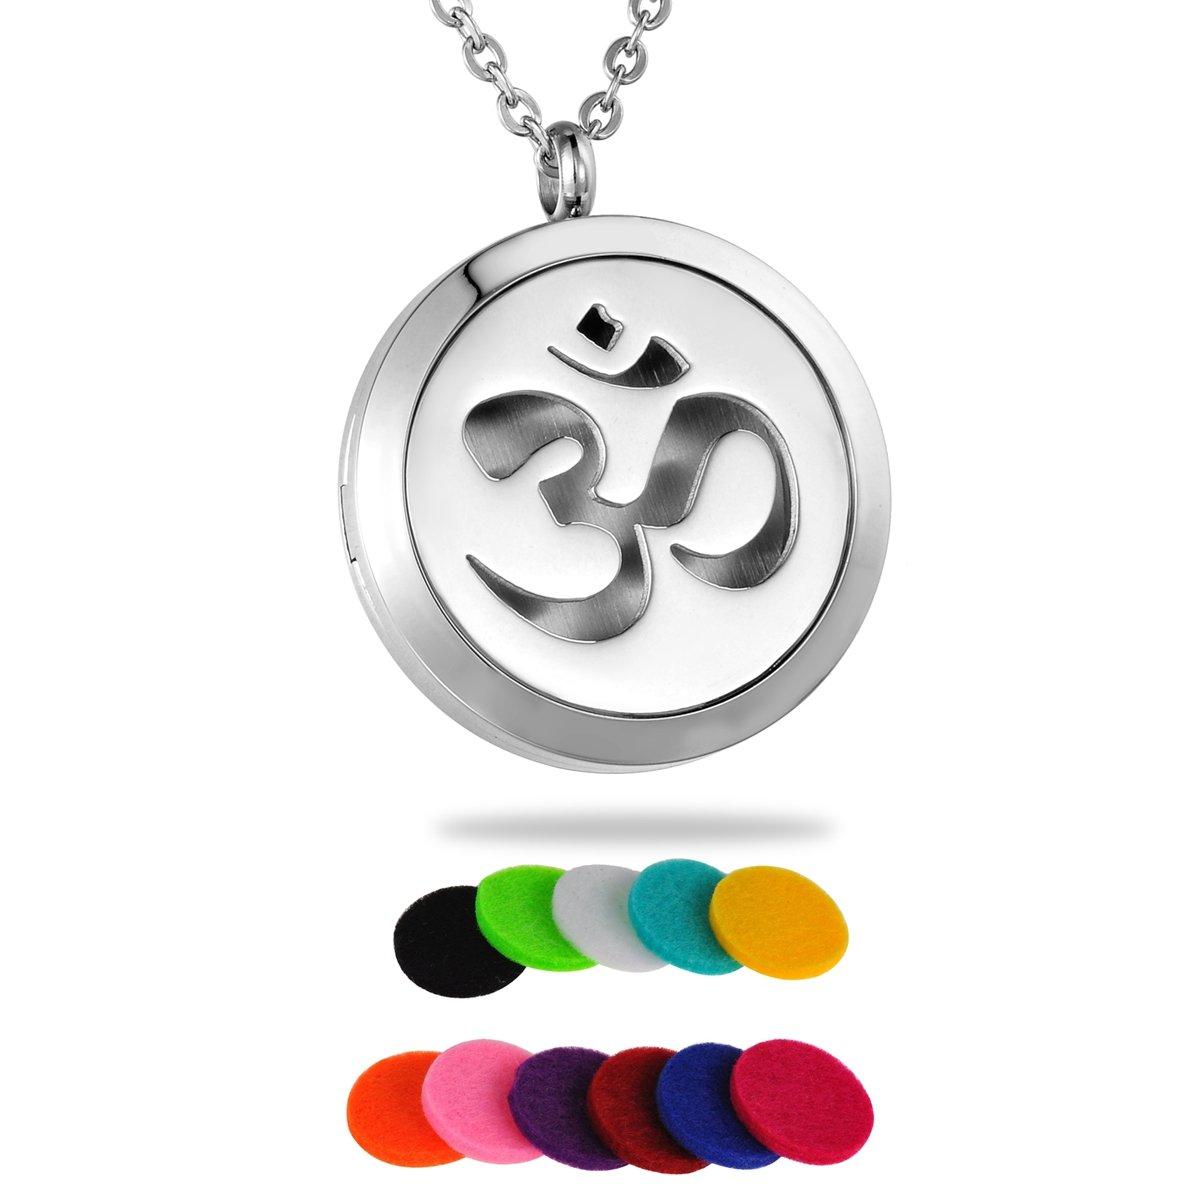 HooAMI Aromatherapy Essential Oil Diffuser Necklace - Yoga Aum Om Ohm Sanskrit Symbol Locket Pendant TY BETY102384